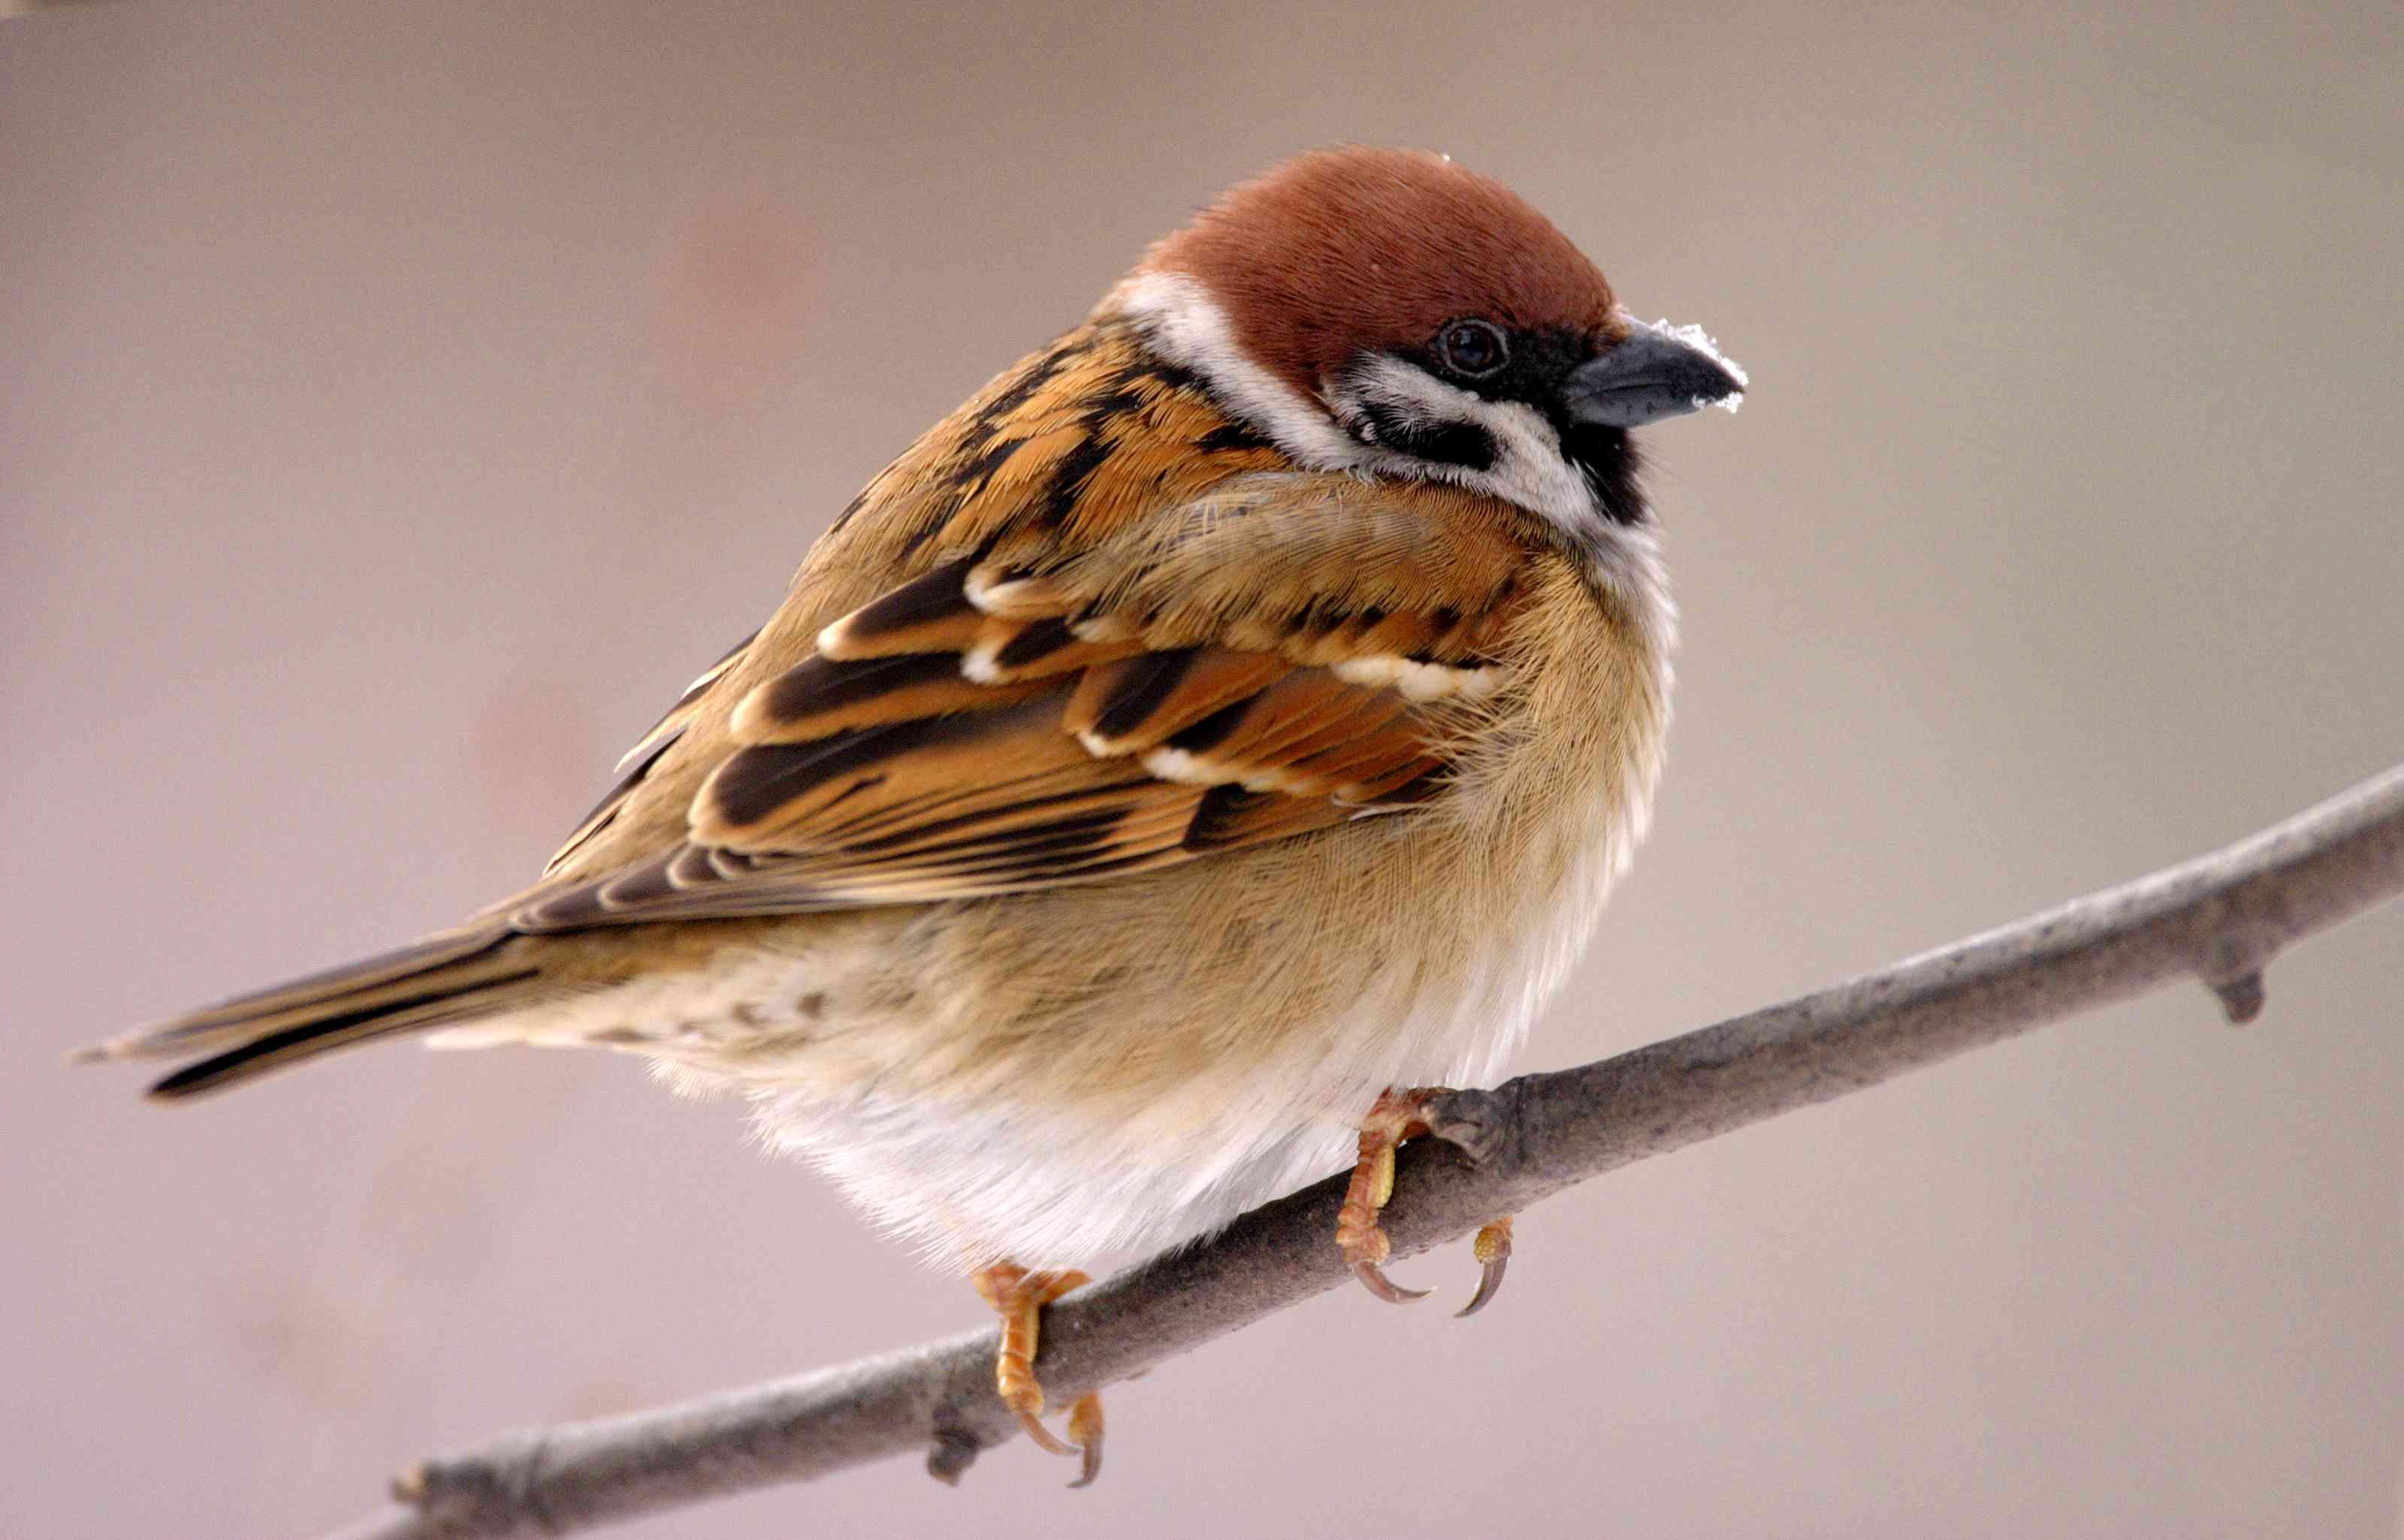 Single Tree Sparrow bird on a tree branch